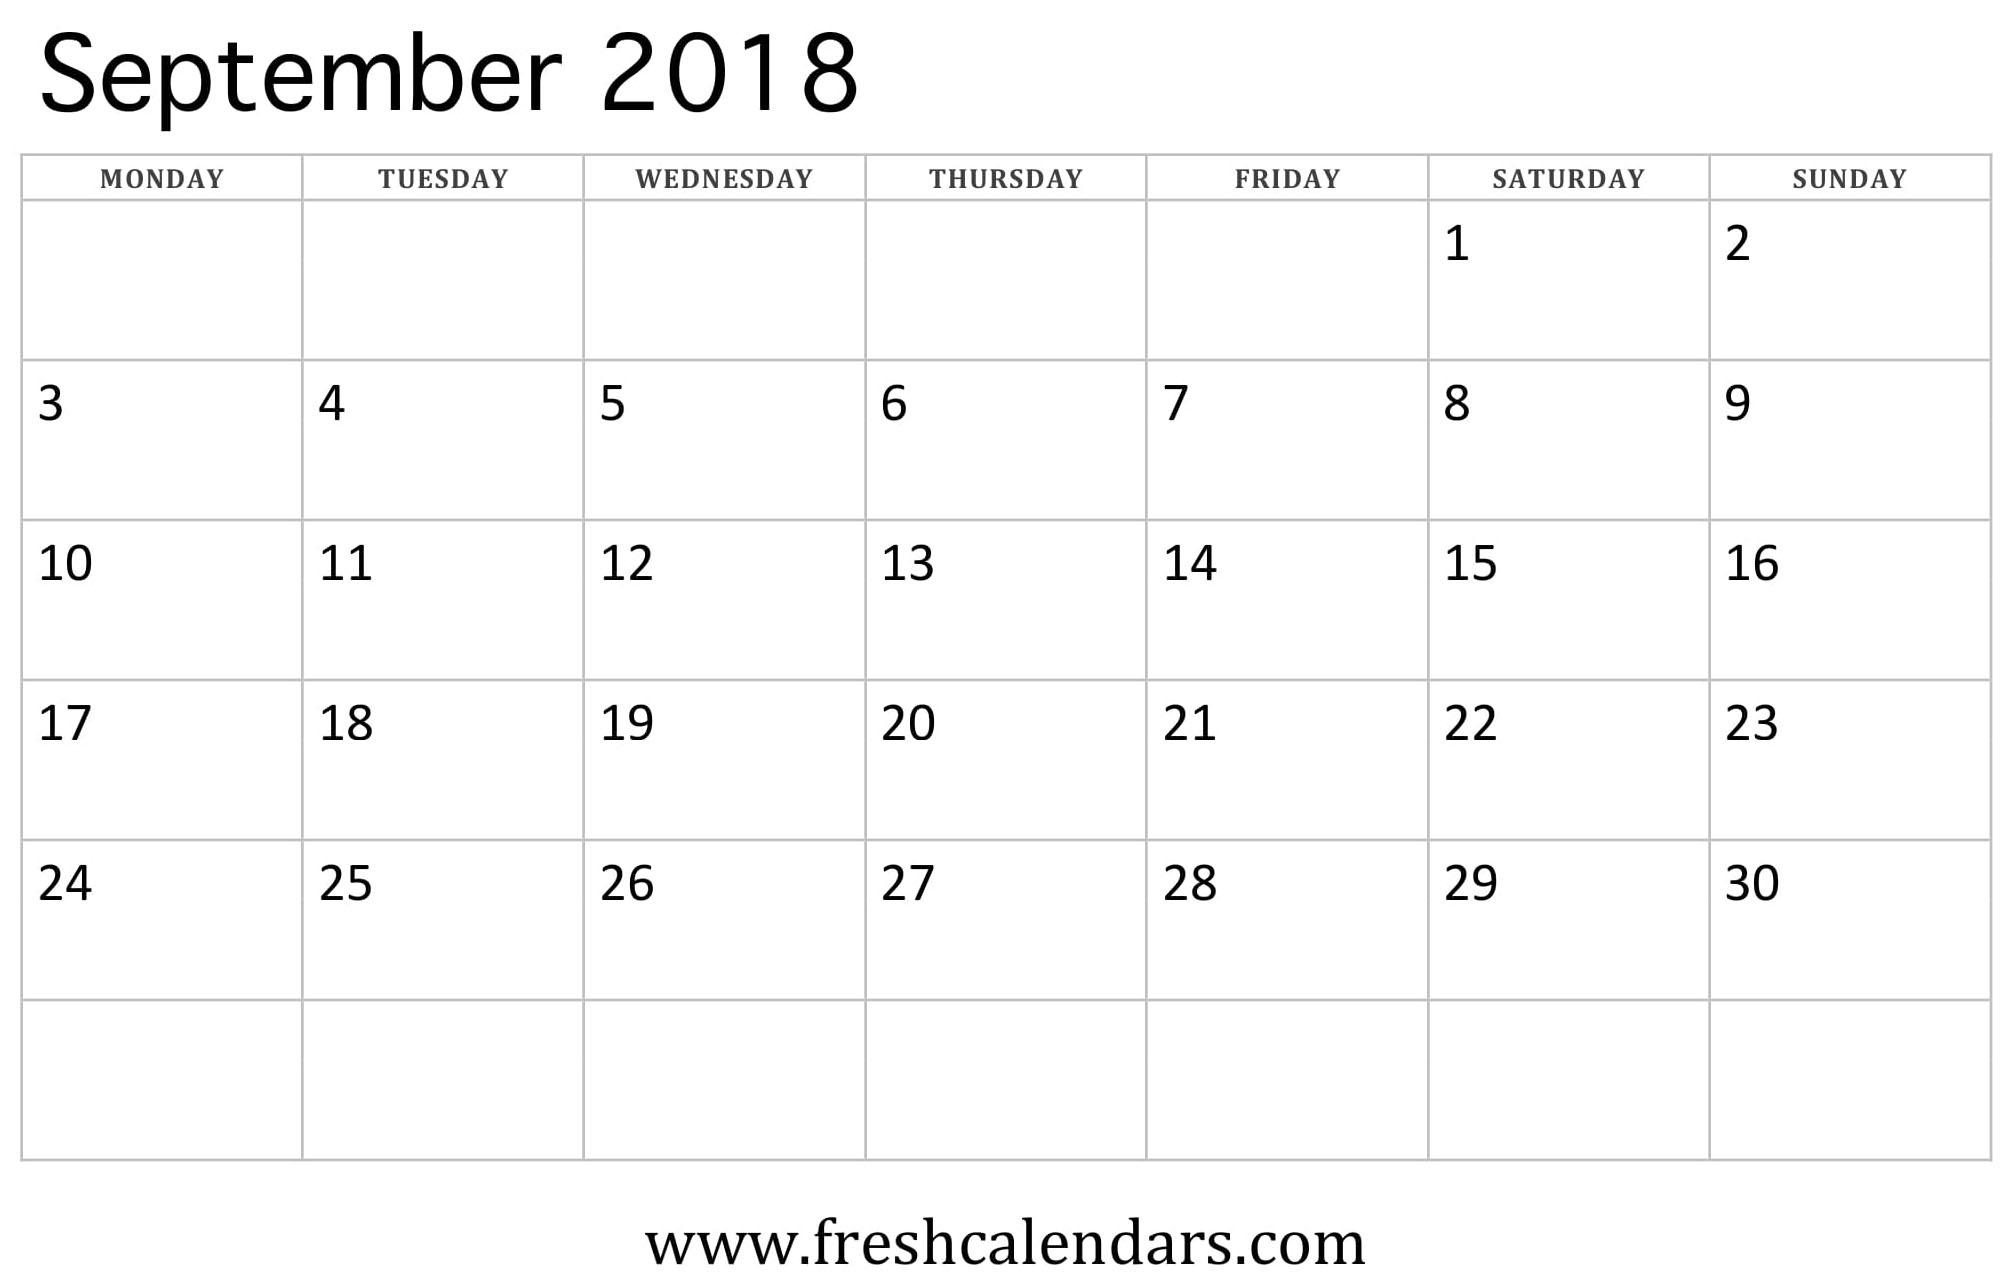 September 2018 Calendar Printable - Fresh Calendars throughout Month Calendar Beginning On Monday